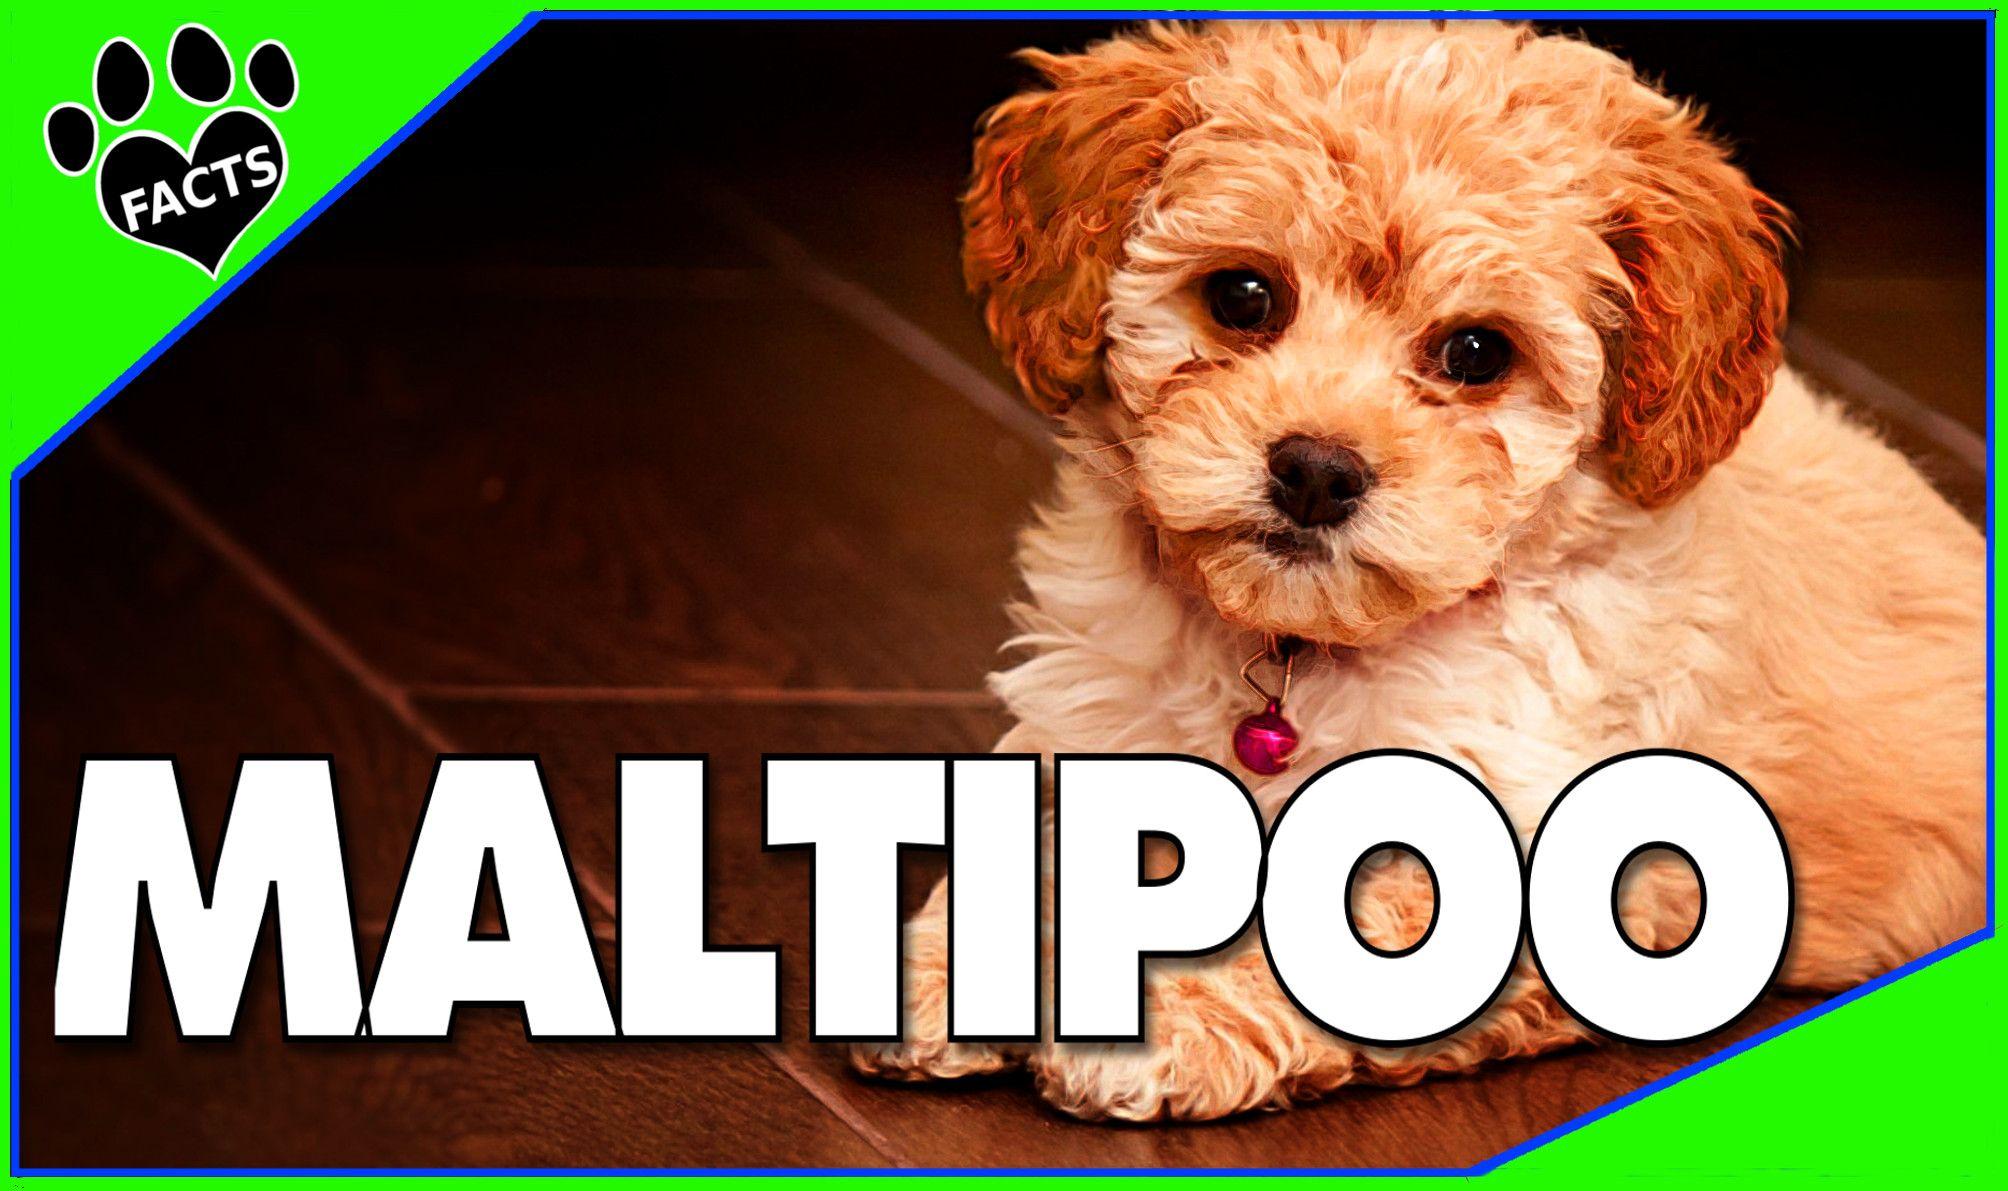 Maltipoo Designer Dogs 101 Fun Facts Maltese Poodle Mix Maltipoo